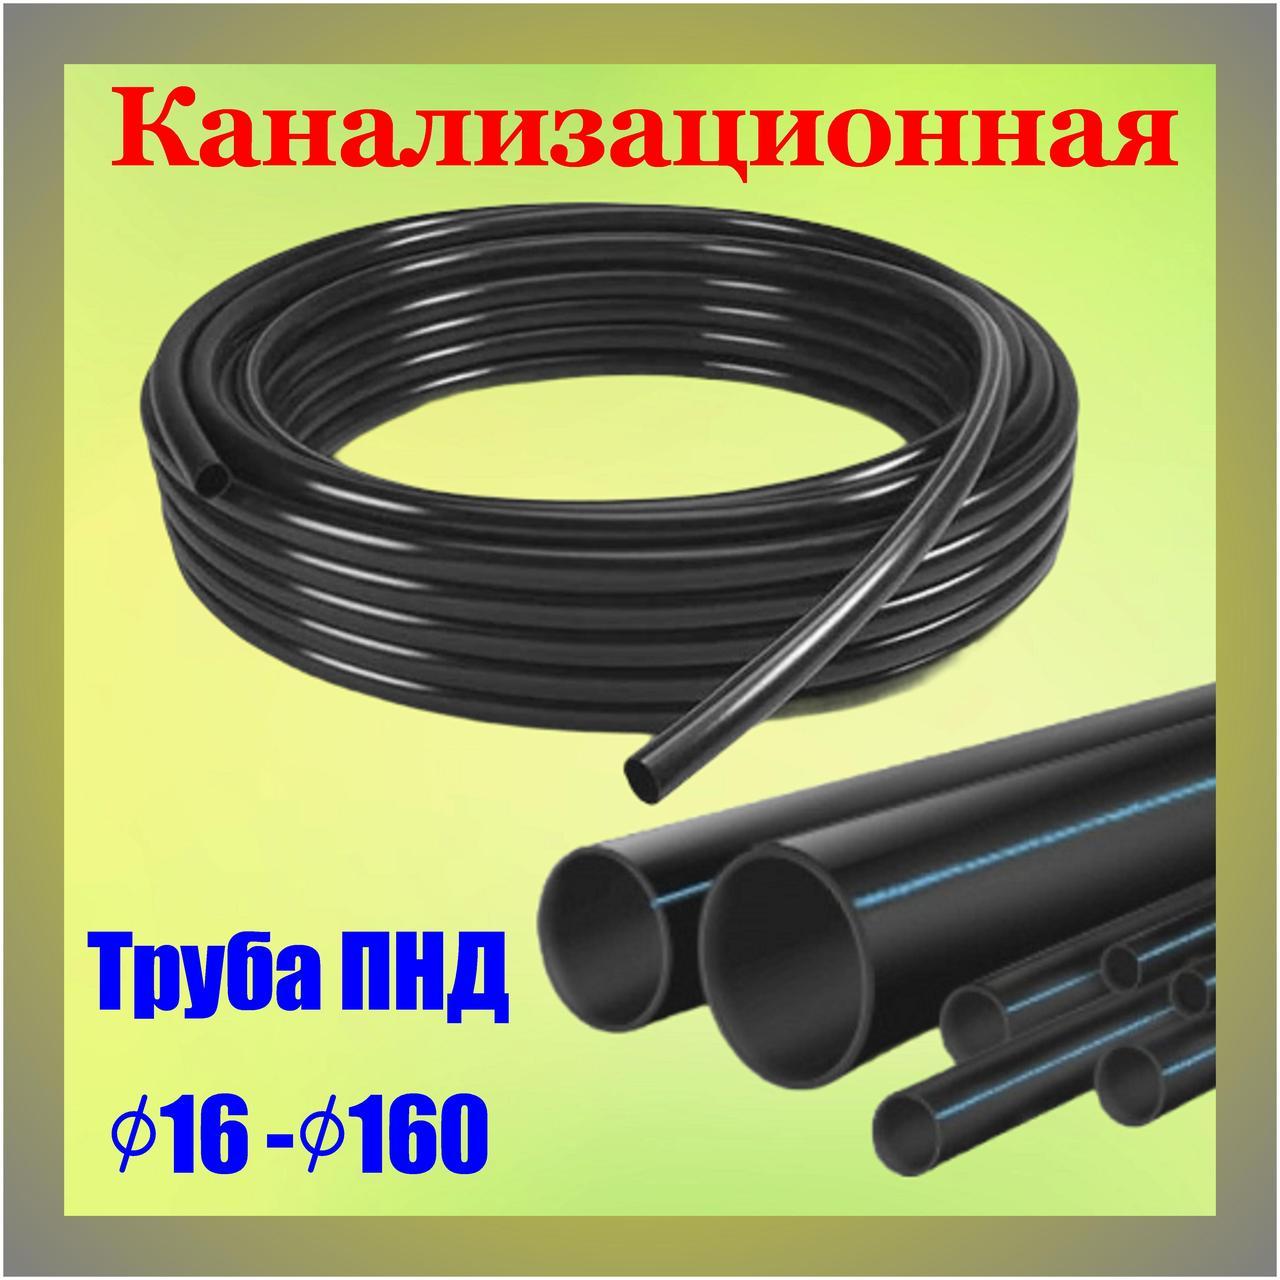 Труба ПНД 90 мм для канализации